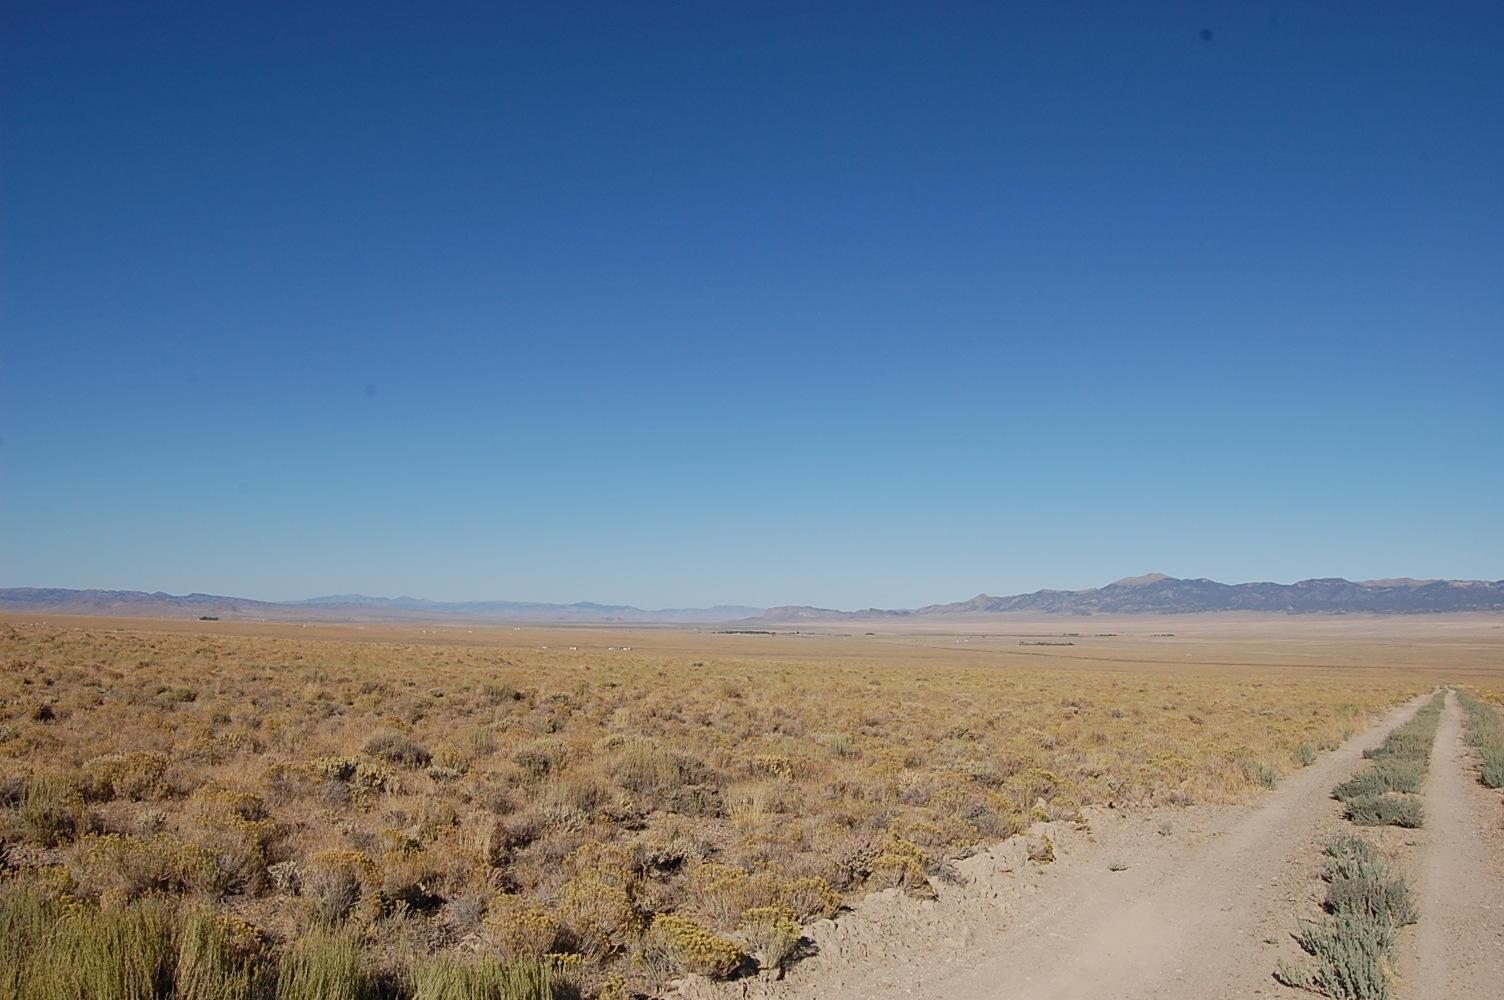 Escape into the Nevada Mountain Range on Stunning 2 Acres - Image 1